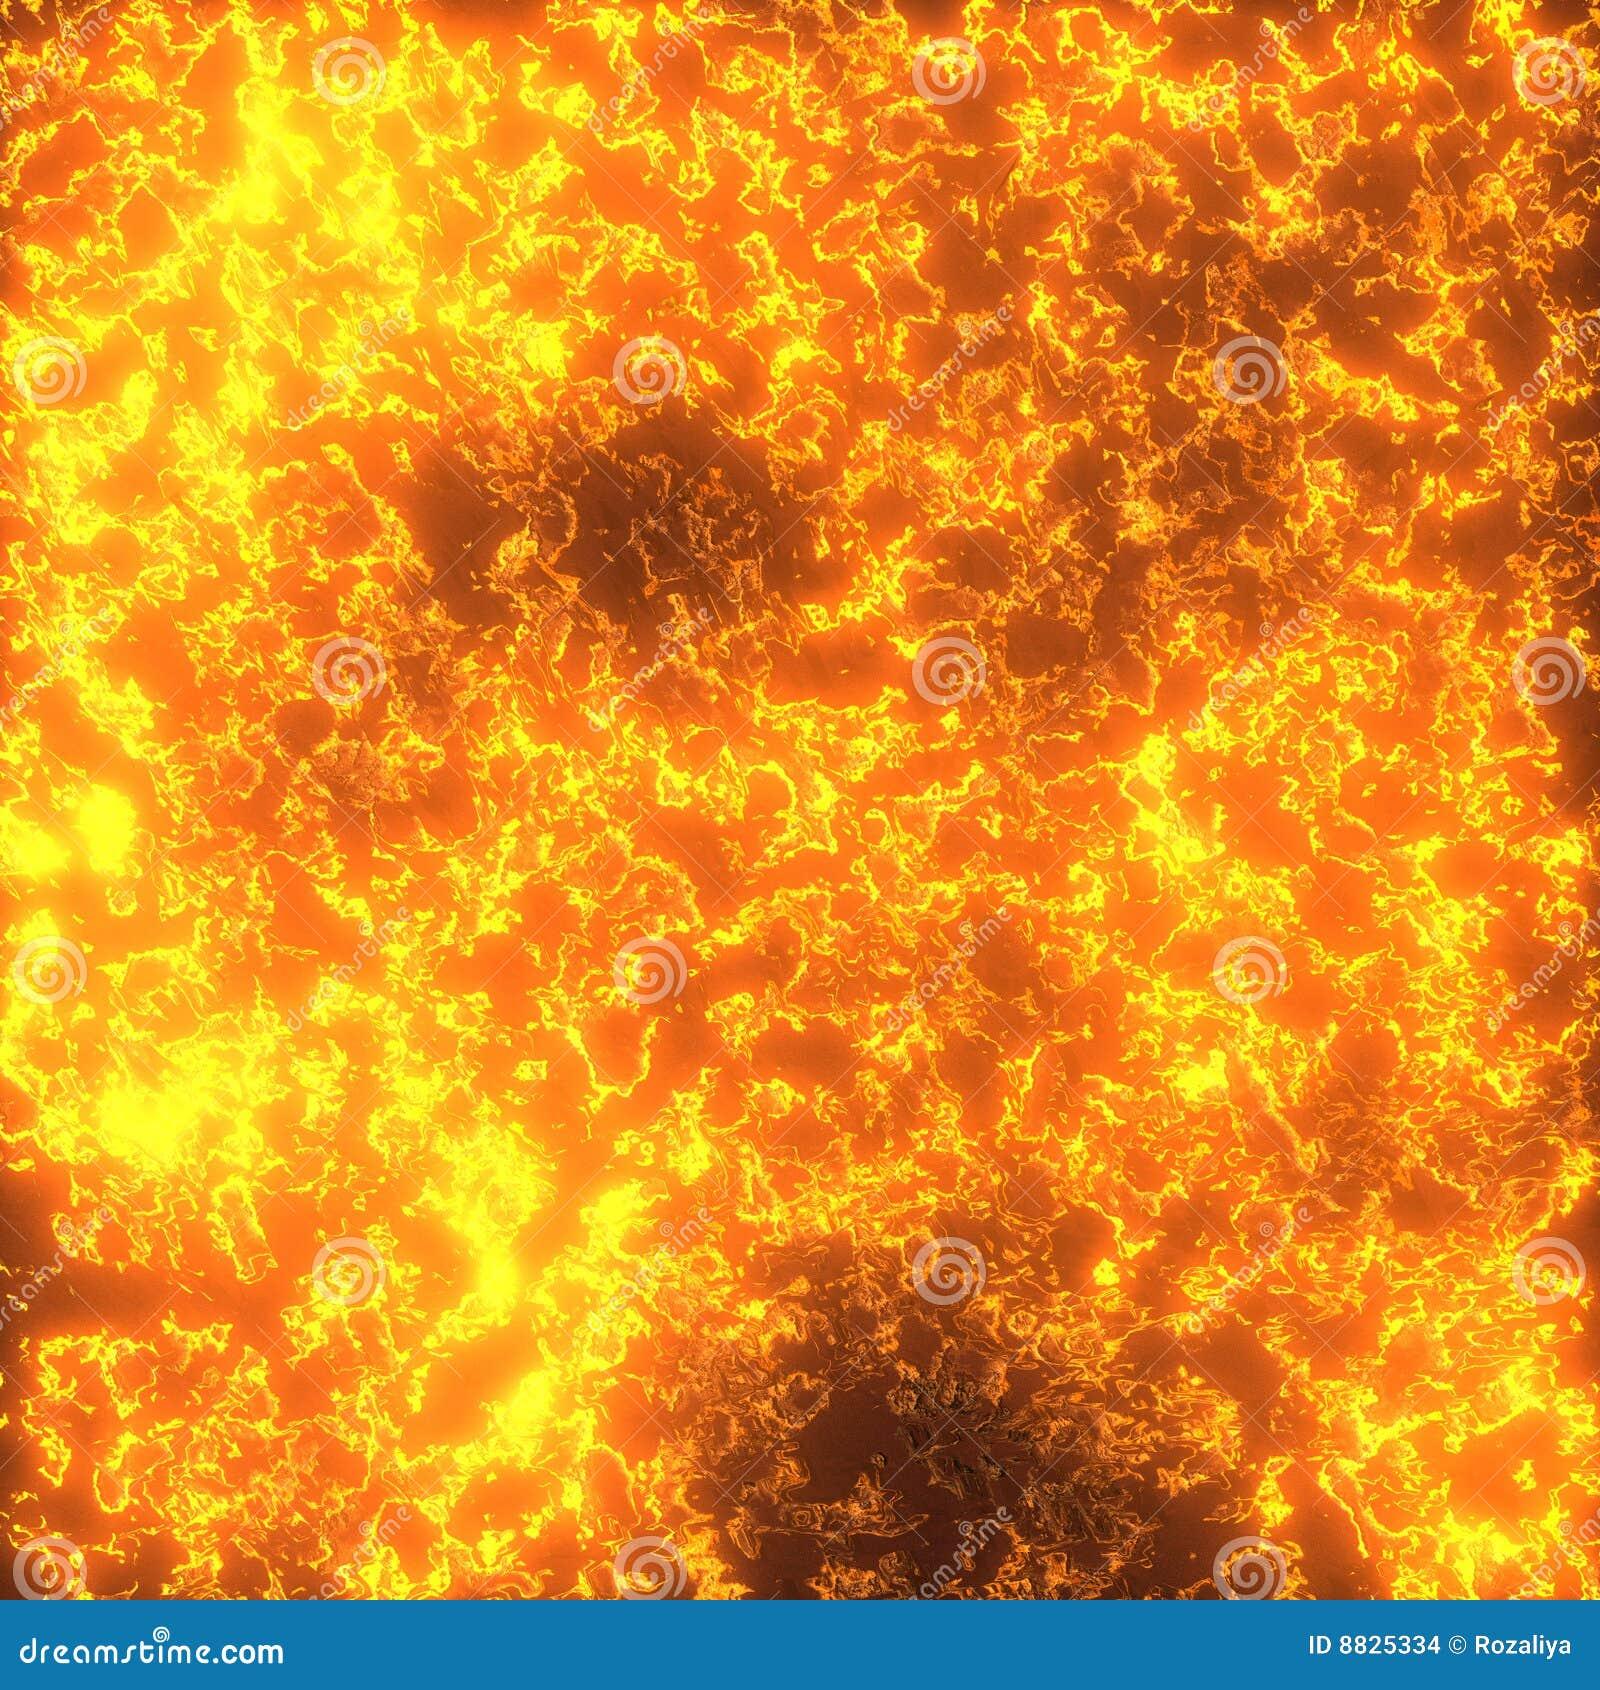 sun texture map nasa - photo #46